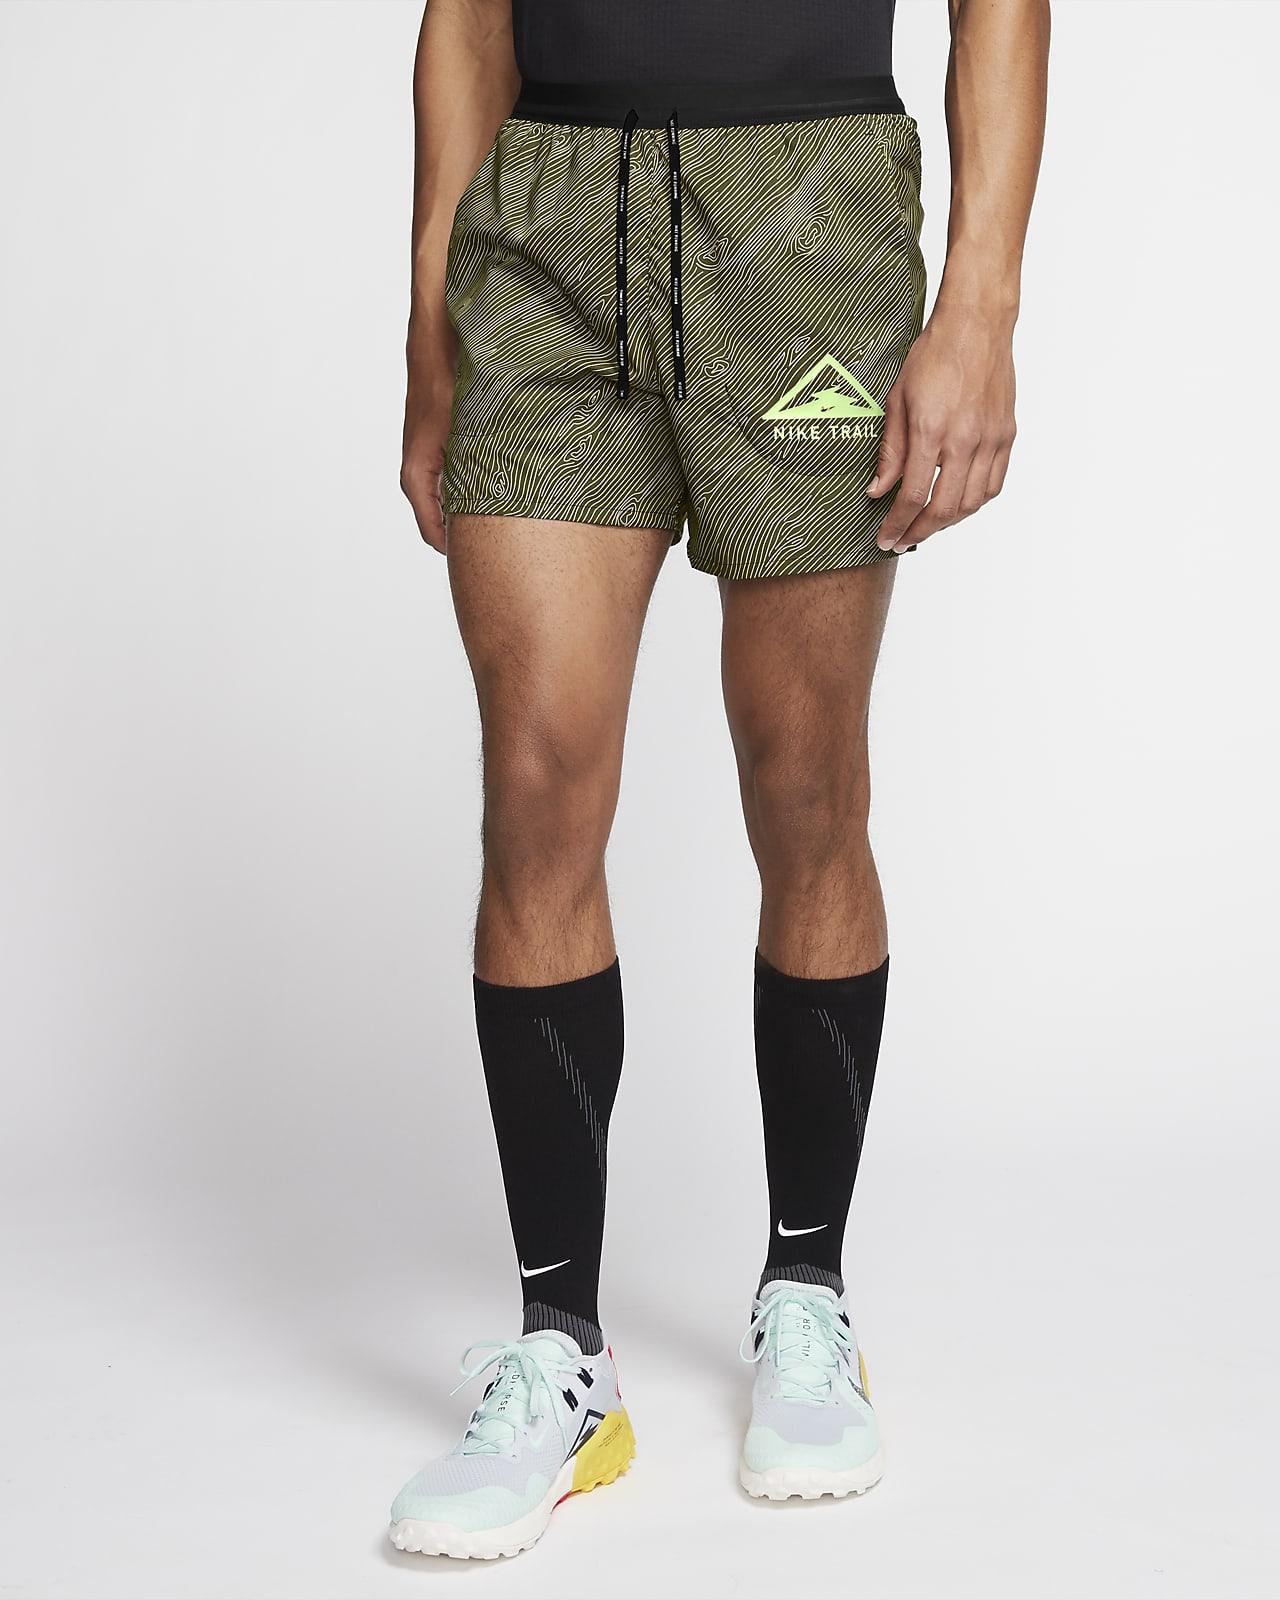 Shorts de trail running de 13 cm para hombre Nike Flex Stride